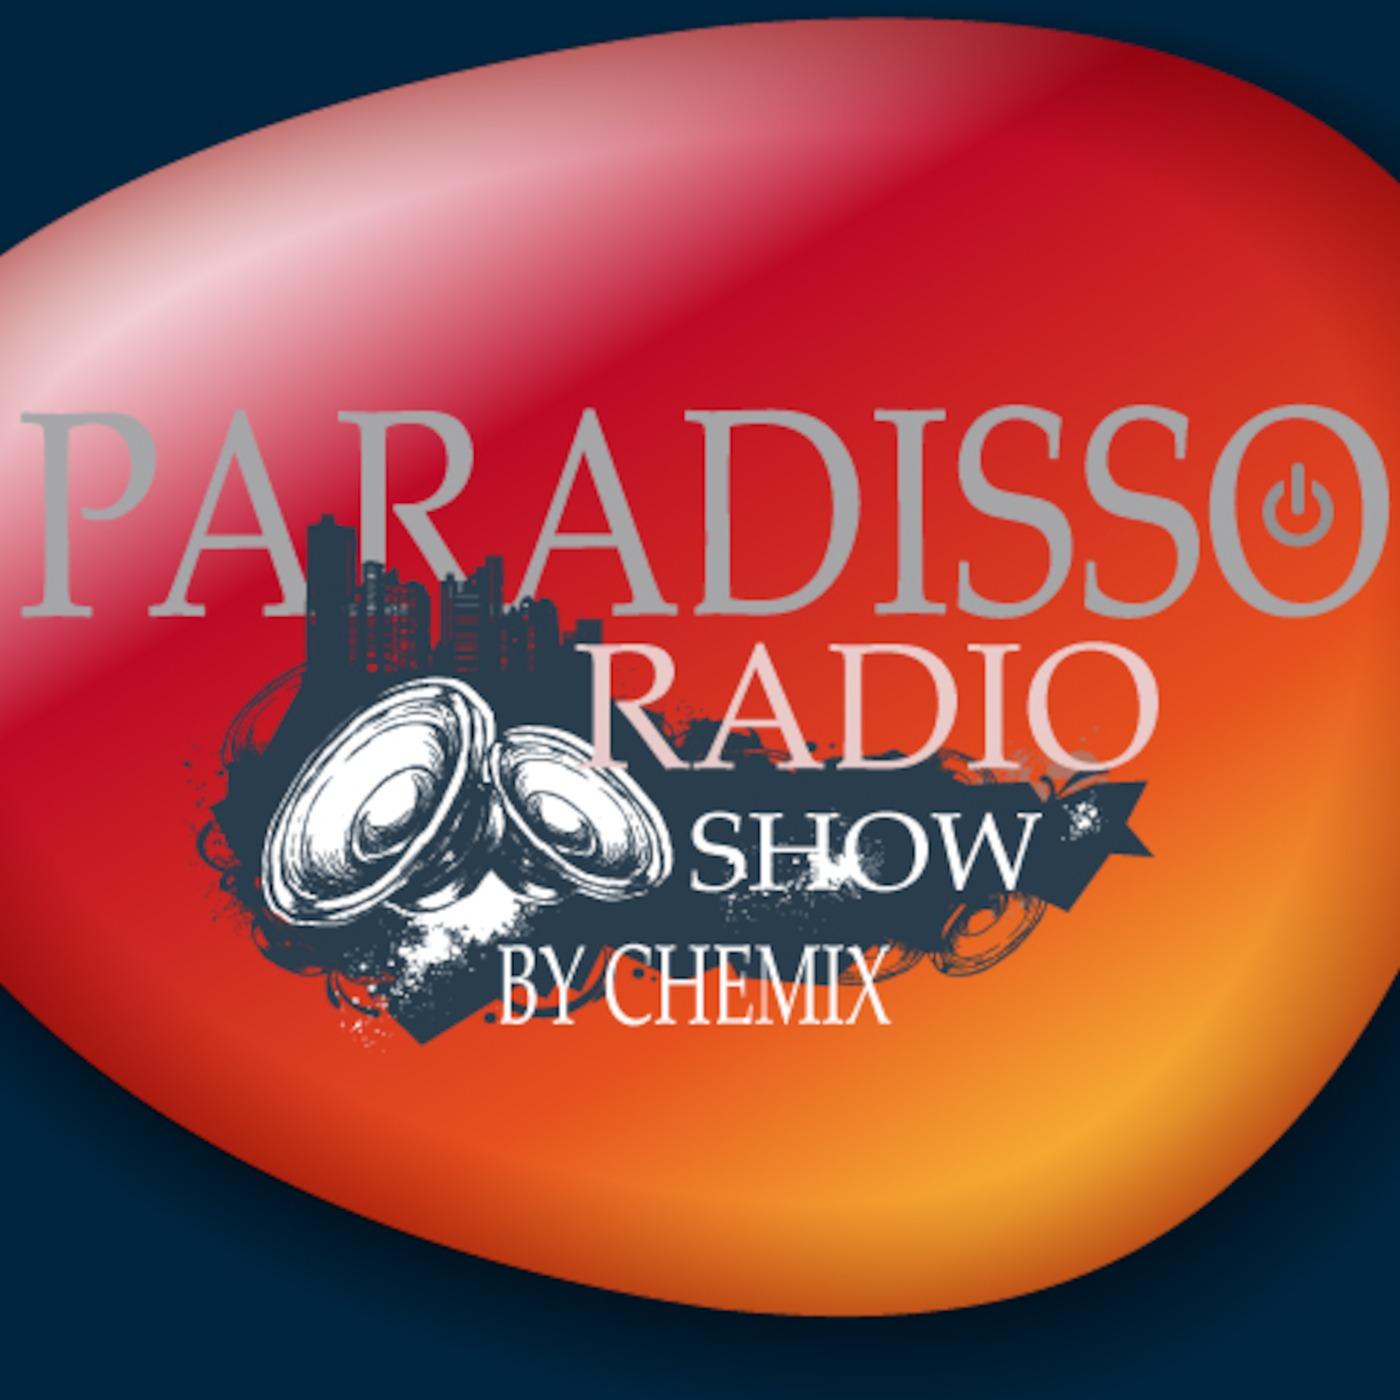 PARADISSO RADIO SHOW BY CHEMIX